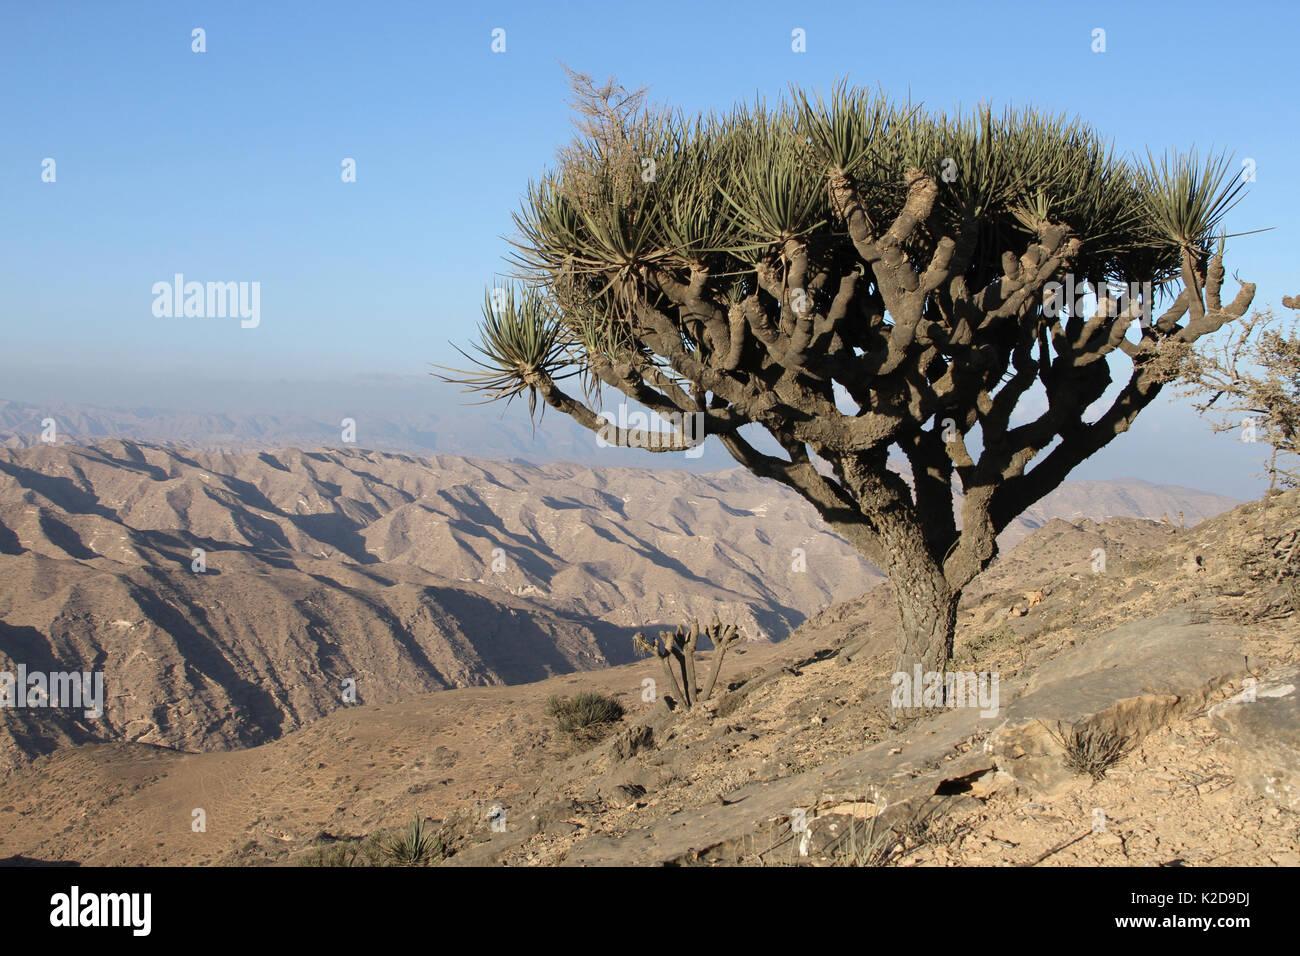 Yemen dragon tree (Dracaena serrulata) in high mountains, Oman, November - Stock Image